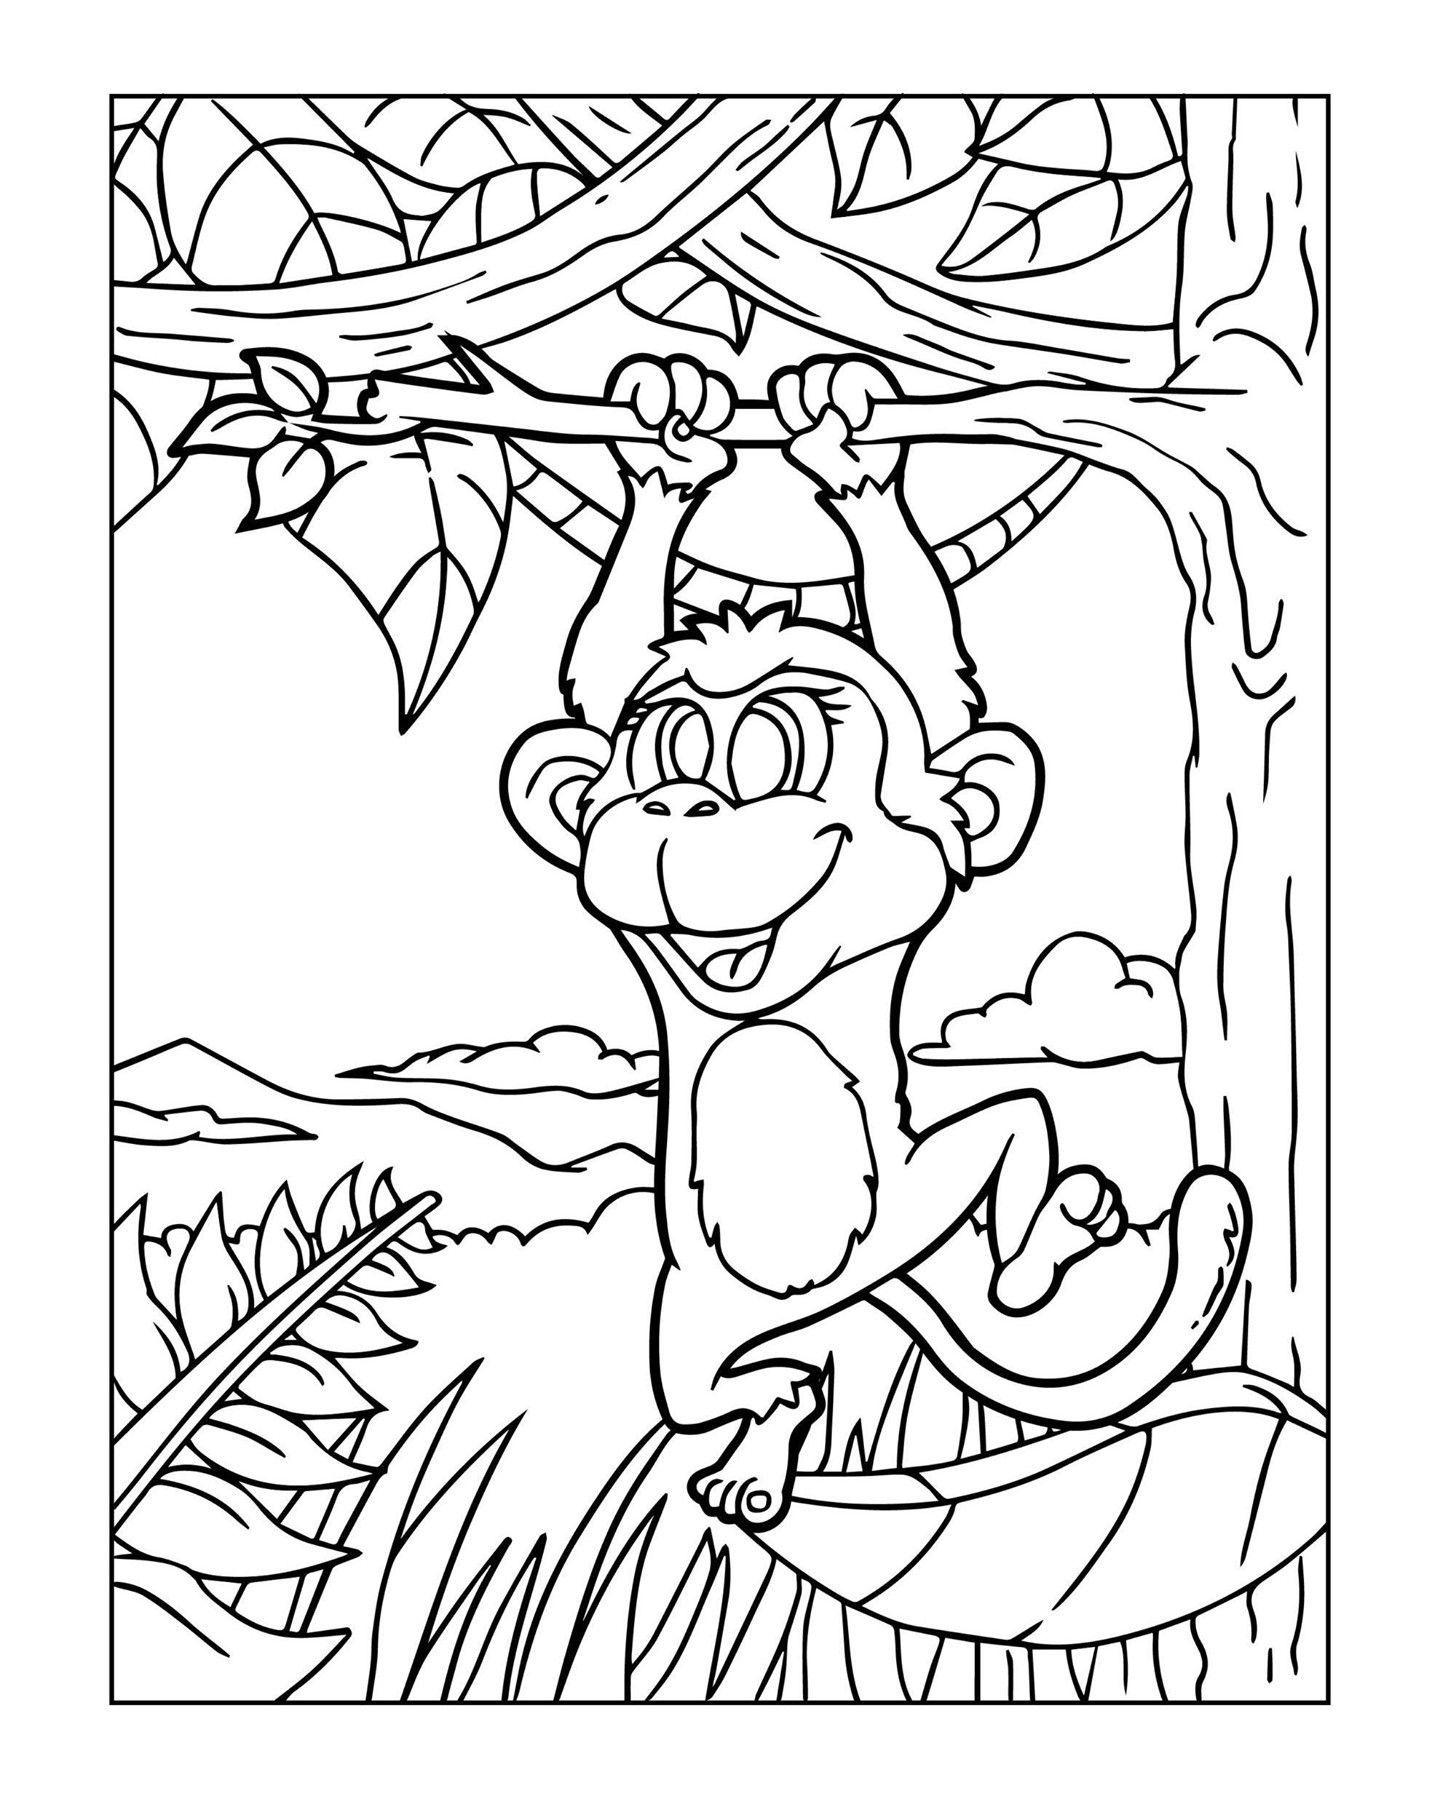 Zoo Animal Coloring Page 10 Zoo Animal Coloring Pages Animal Coloring Pages Coloring Pages [ 1799 x 1440 Pixel ]